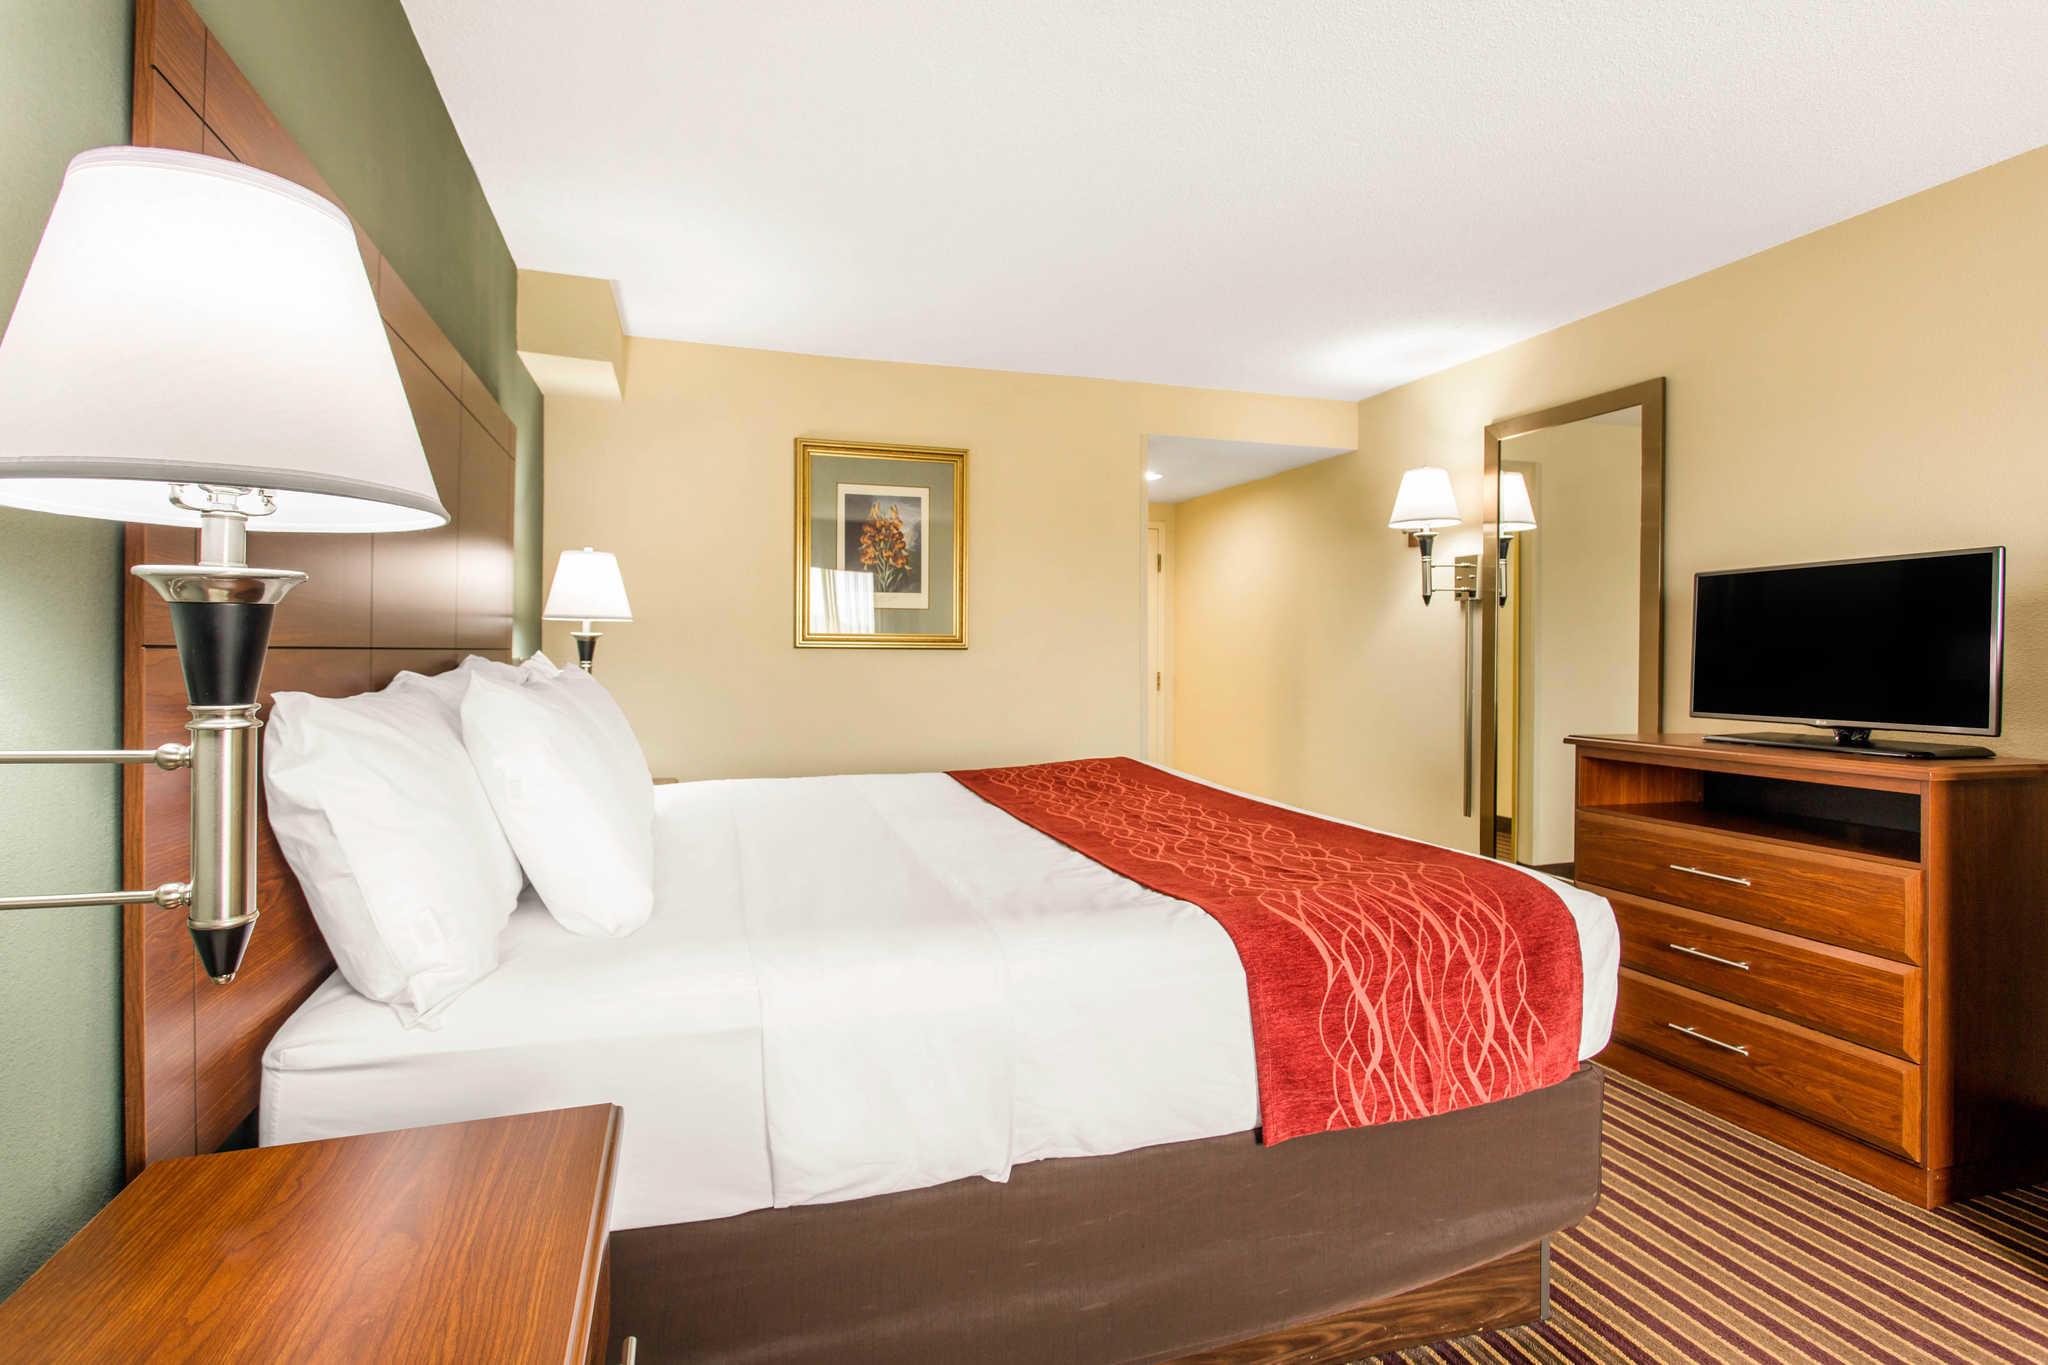 Comfort Inn & Suites Crabtree Valley image 10